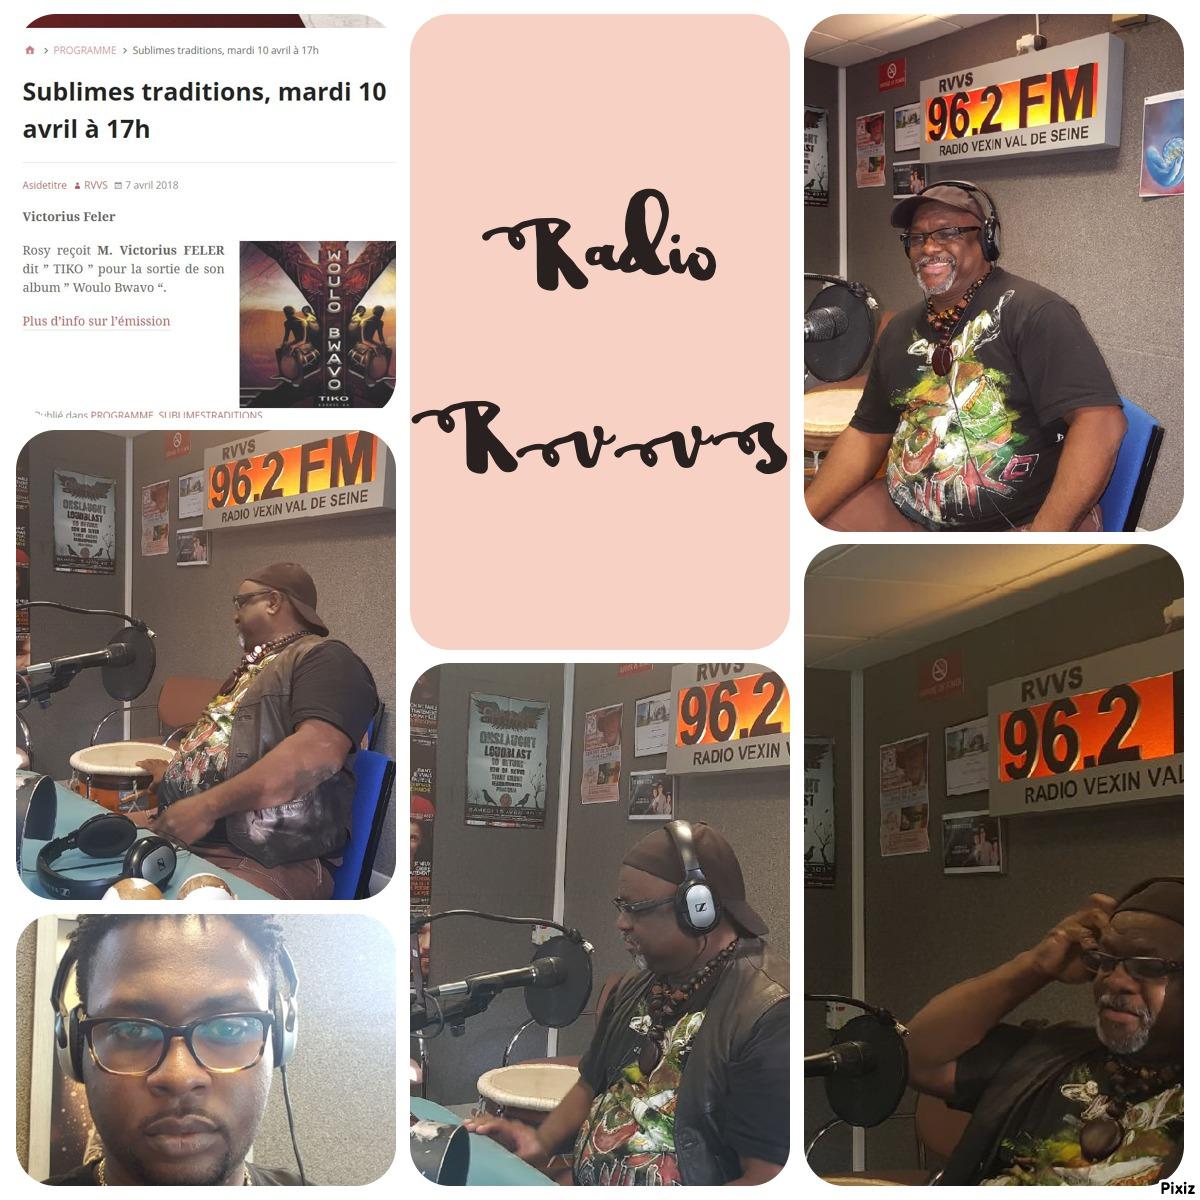 RADIO RVVS